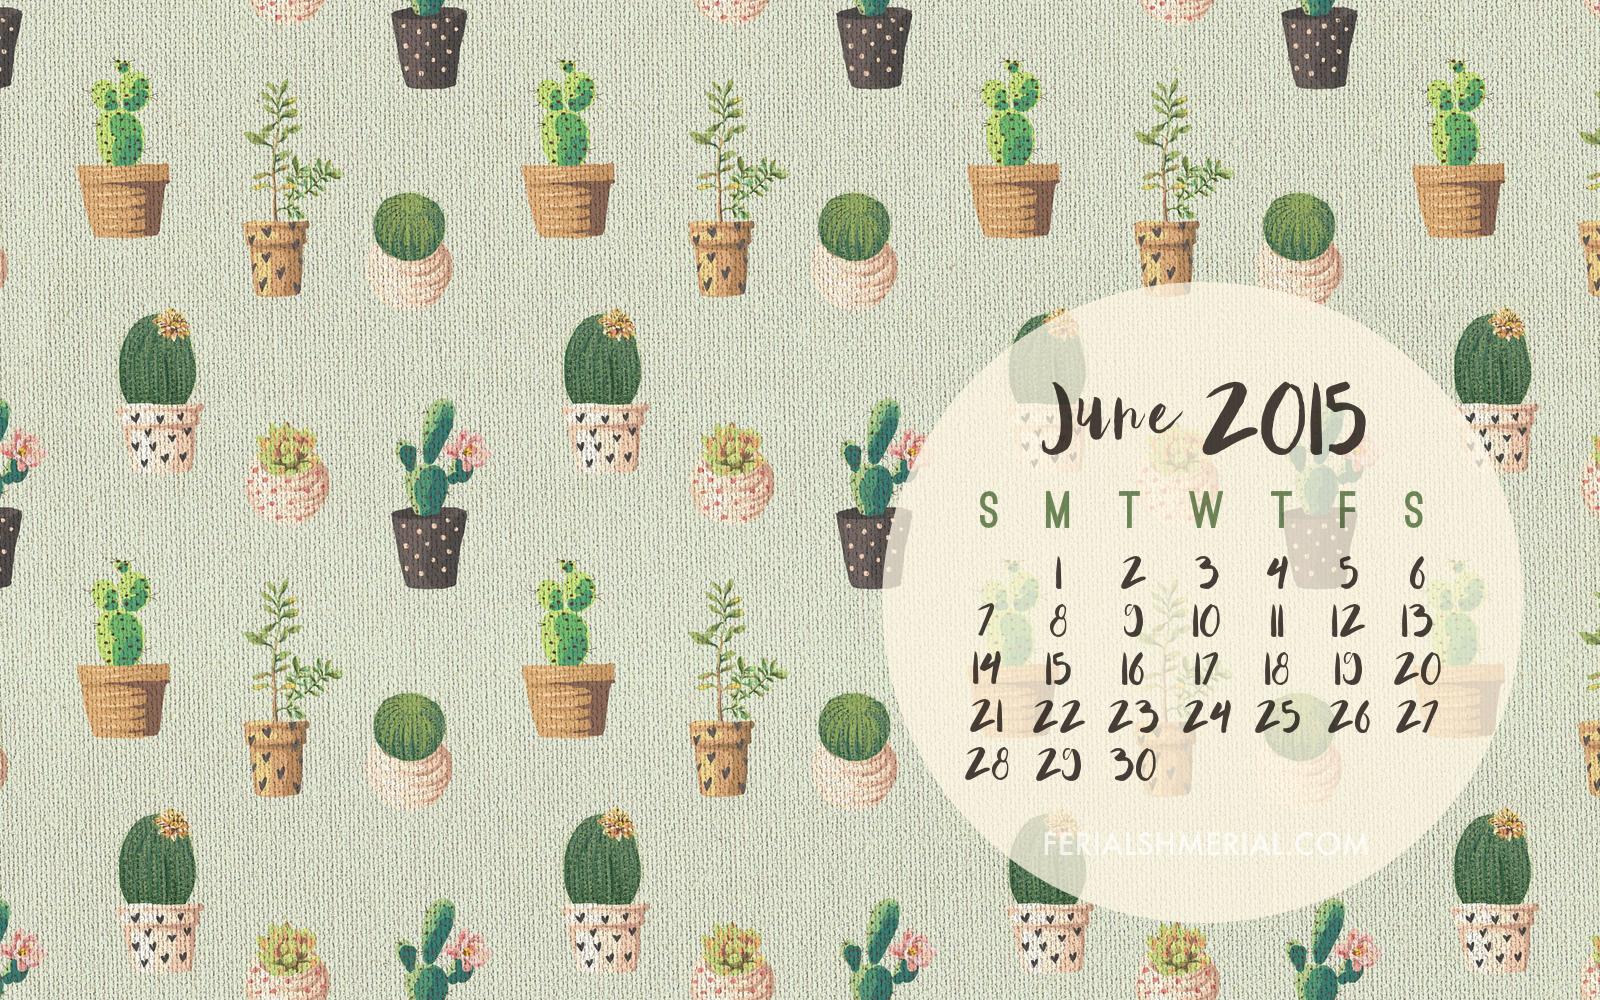 Click here to download the June desktop calendar and phone wallpaper.